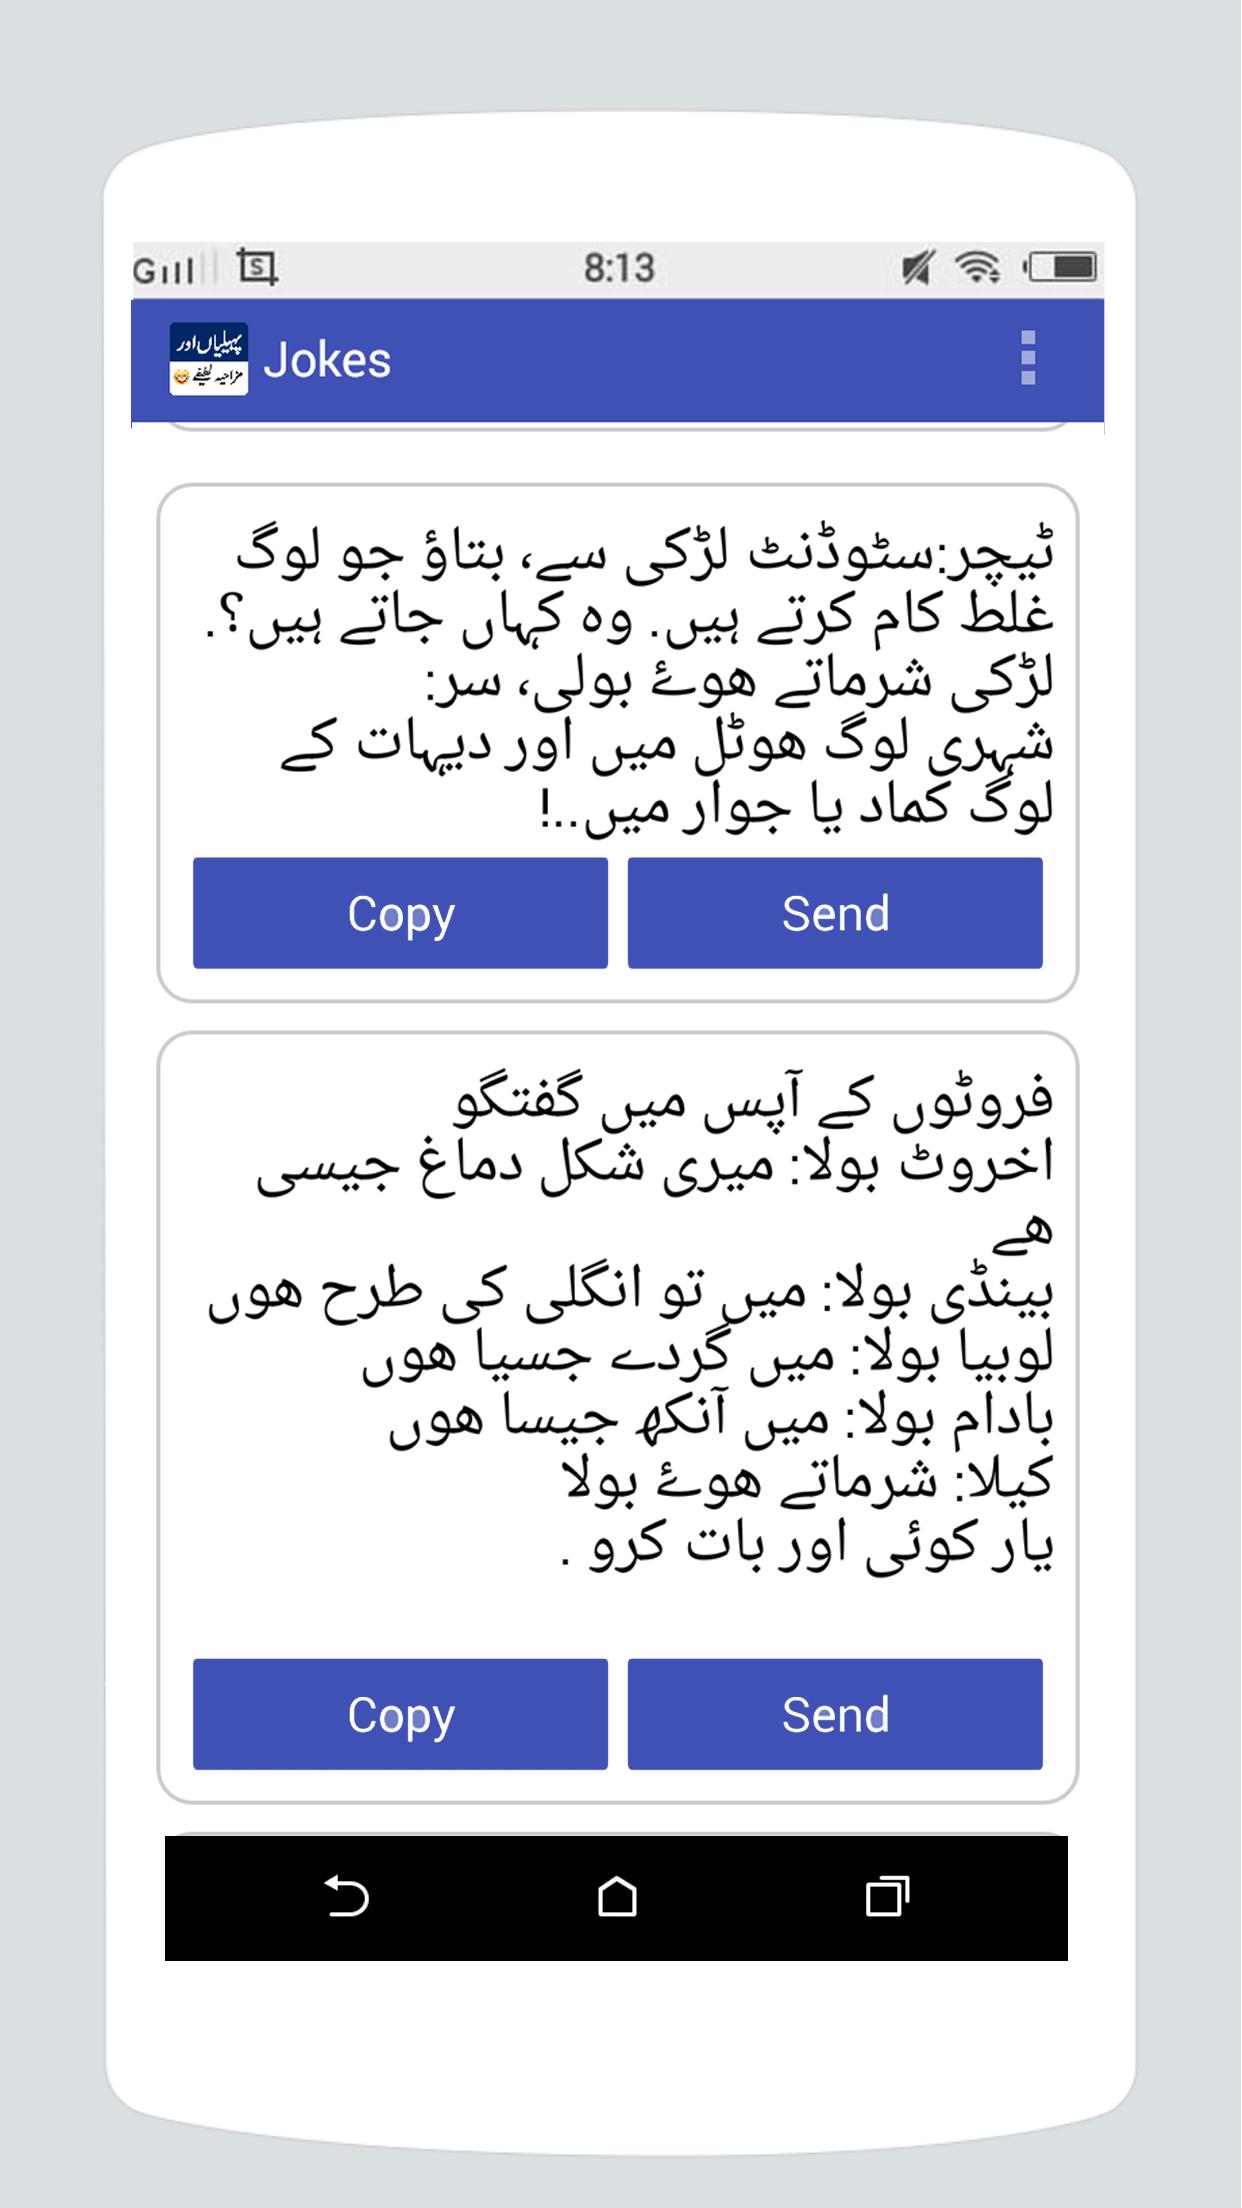 Urdu Puzzles Riddles Quizzes Brain Teasers Funny